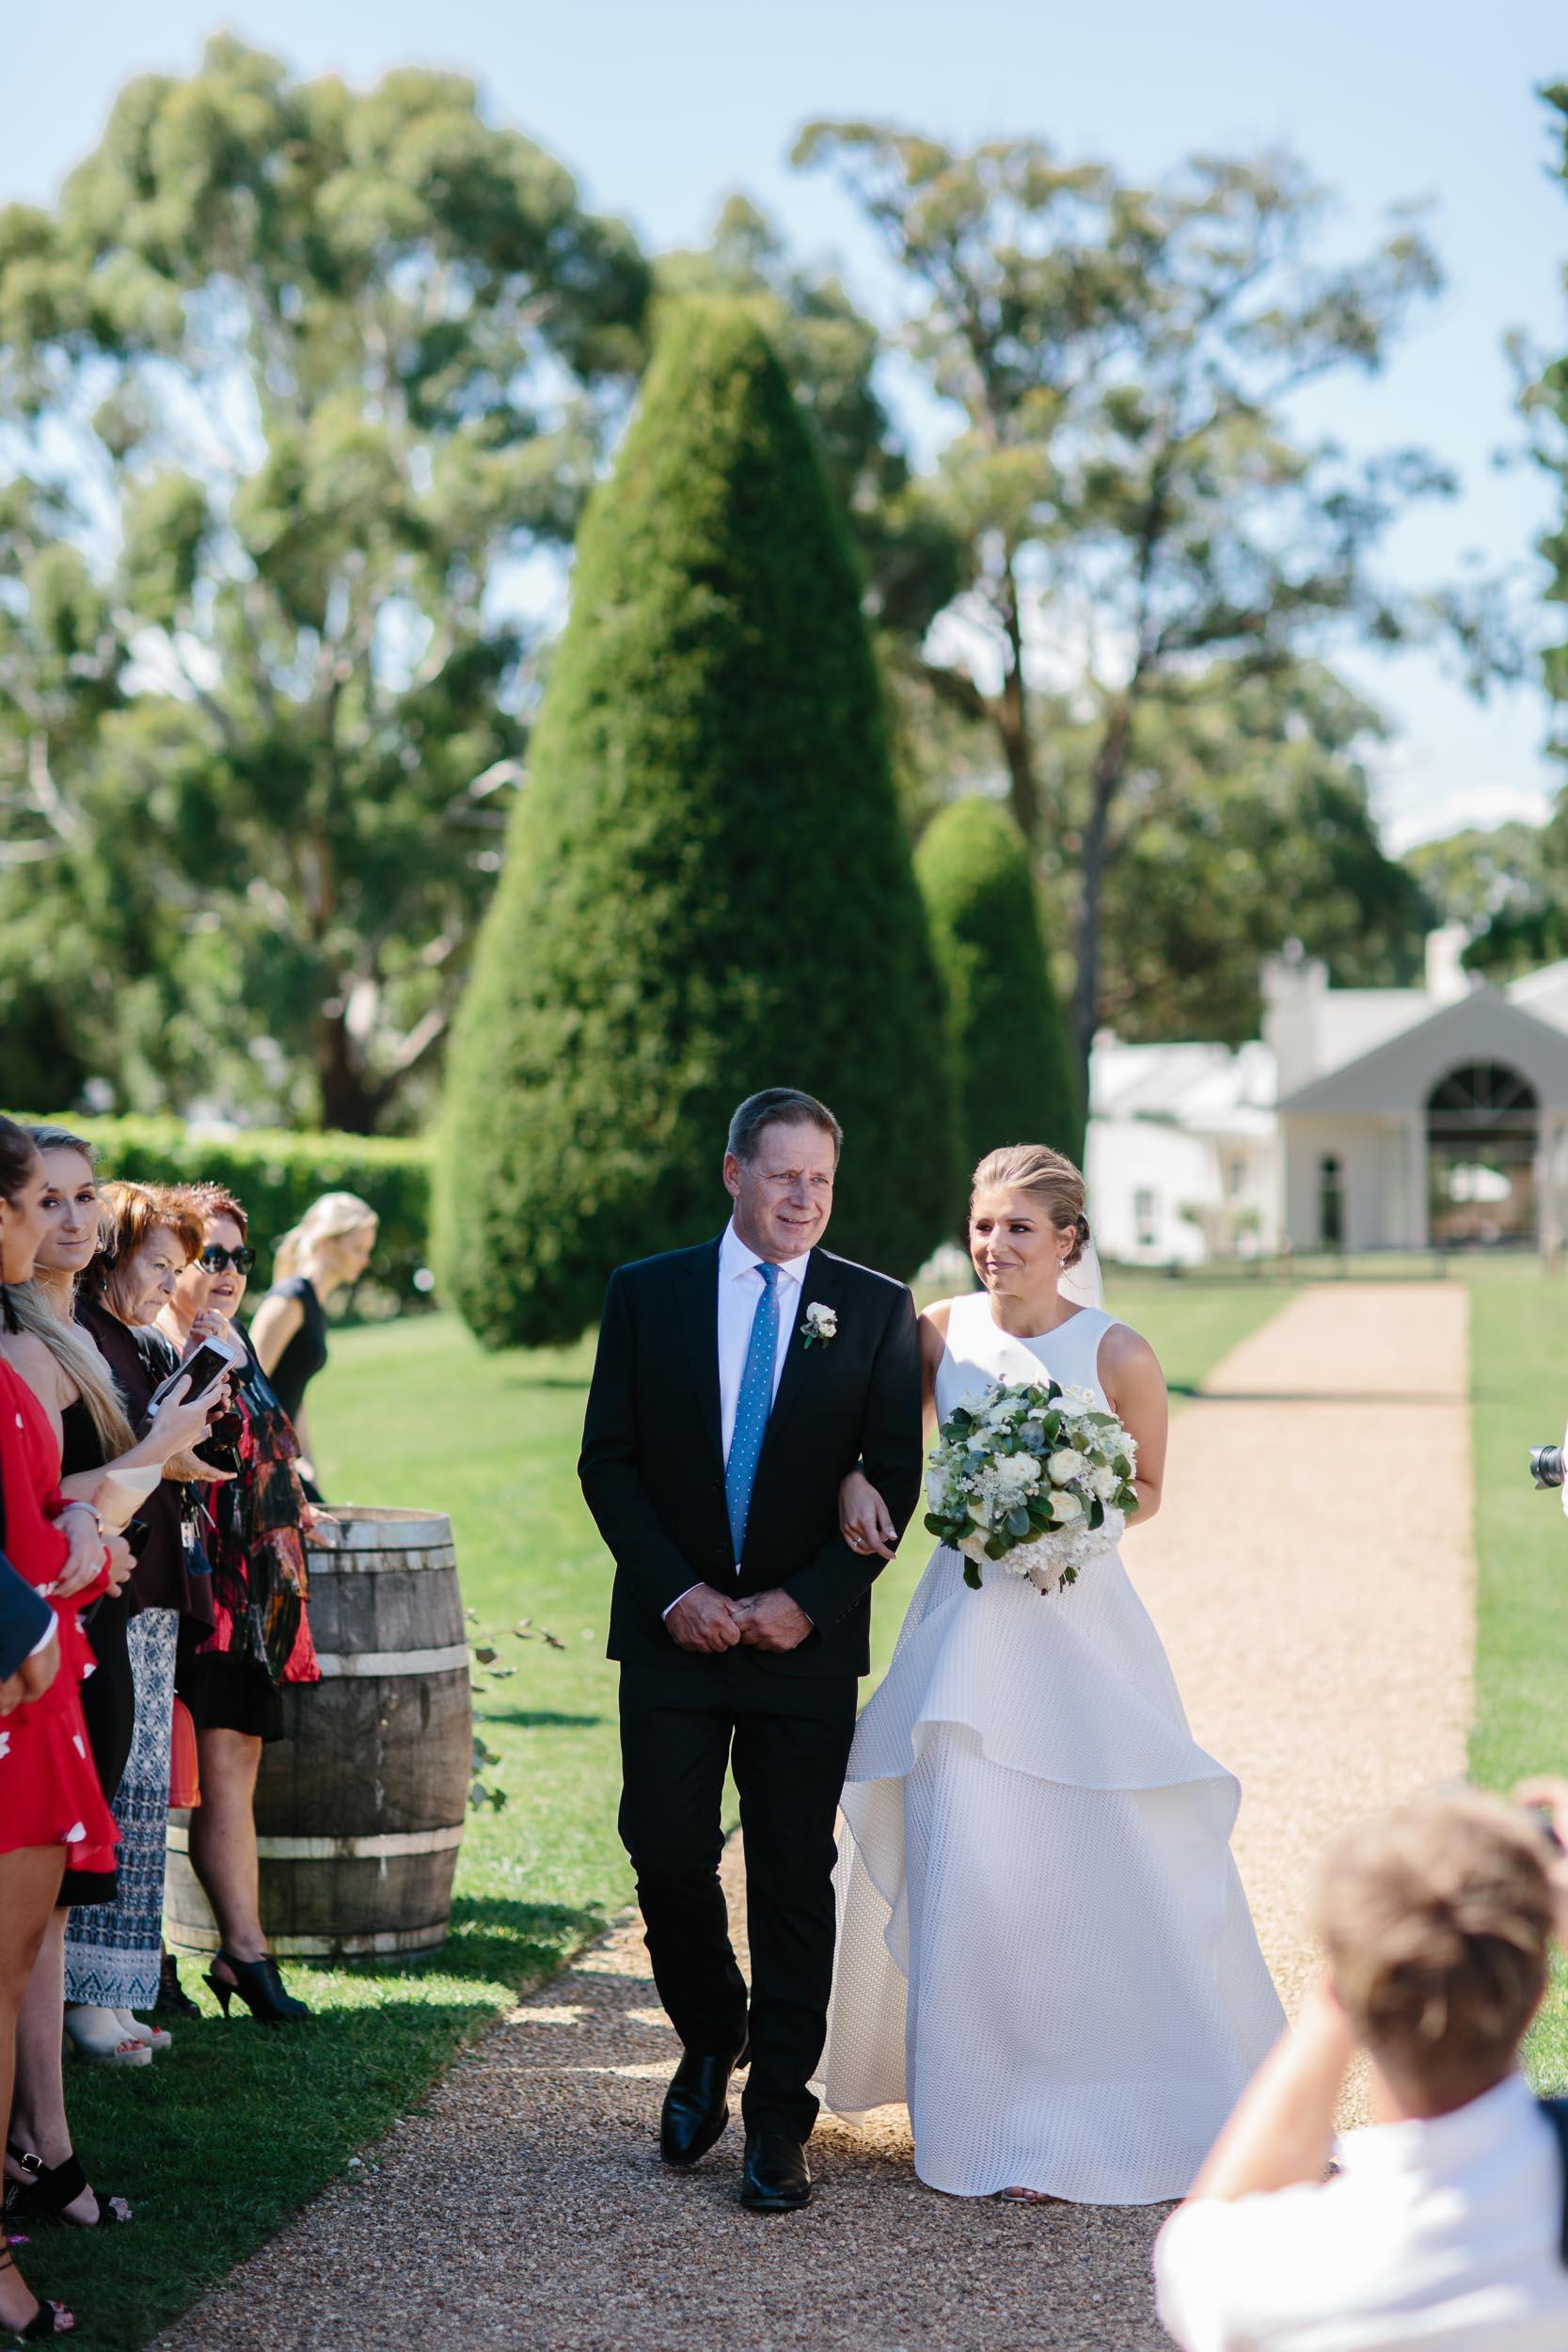 Kas-Richards-Mornington-Peninsula-Wedding-Lindenderry-Red-Hill-202.jpg